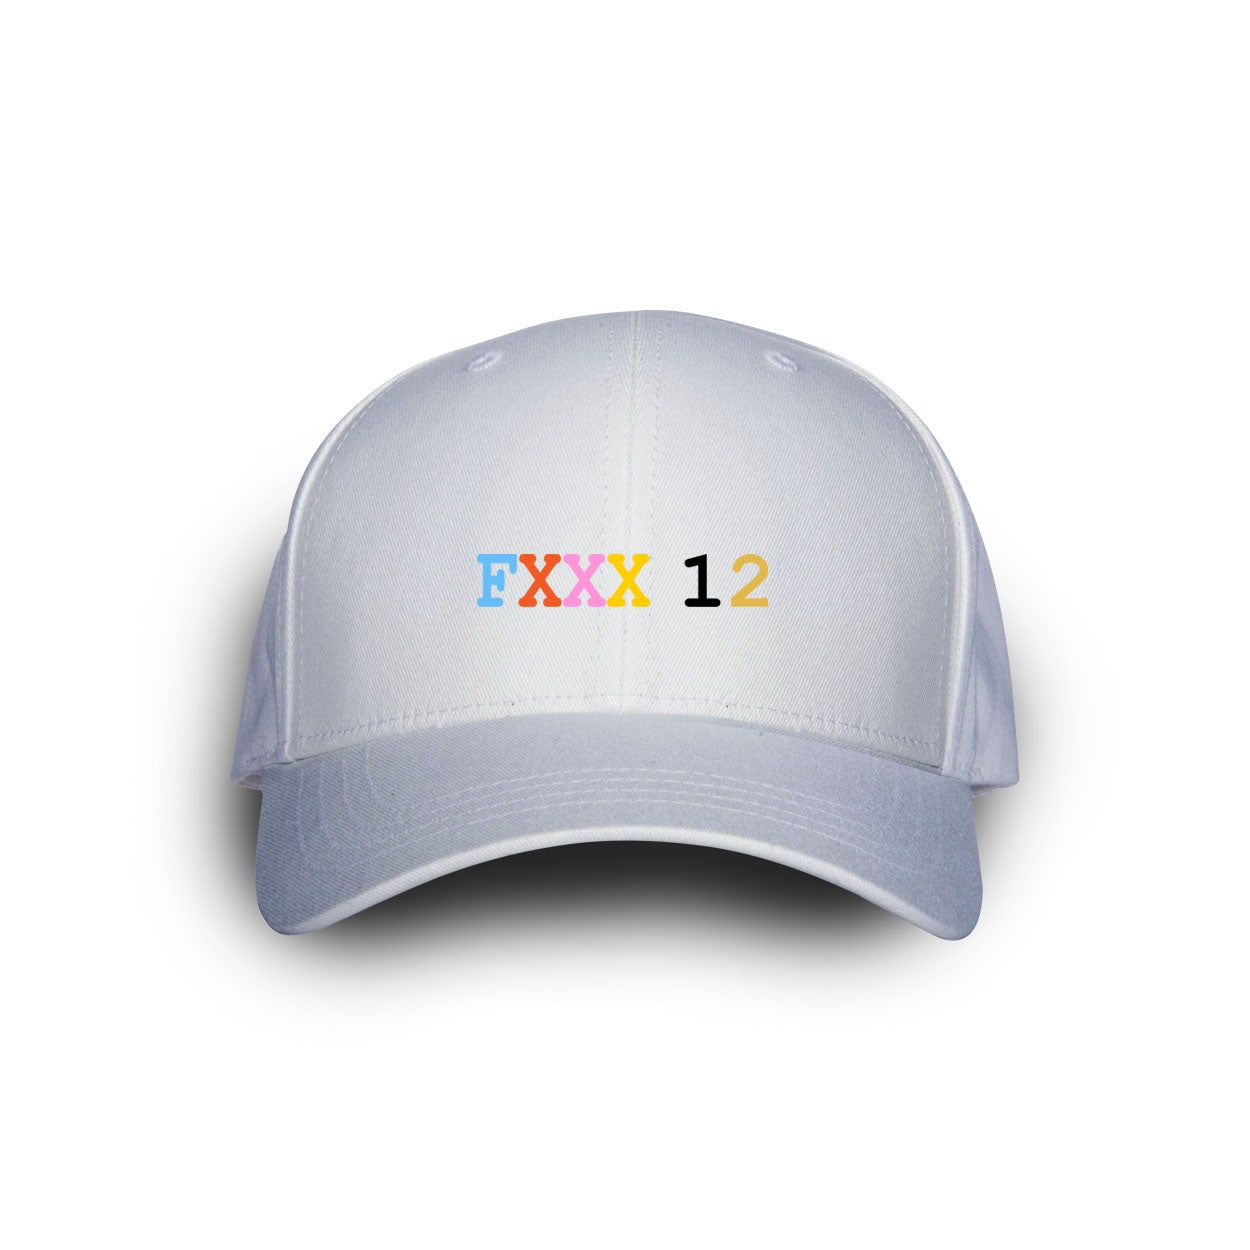 Image of Fxxx 12 Dad Cap White w Colors.